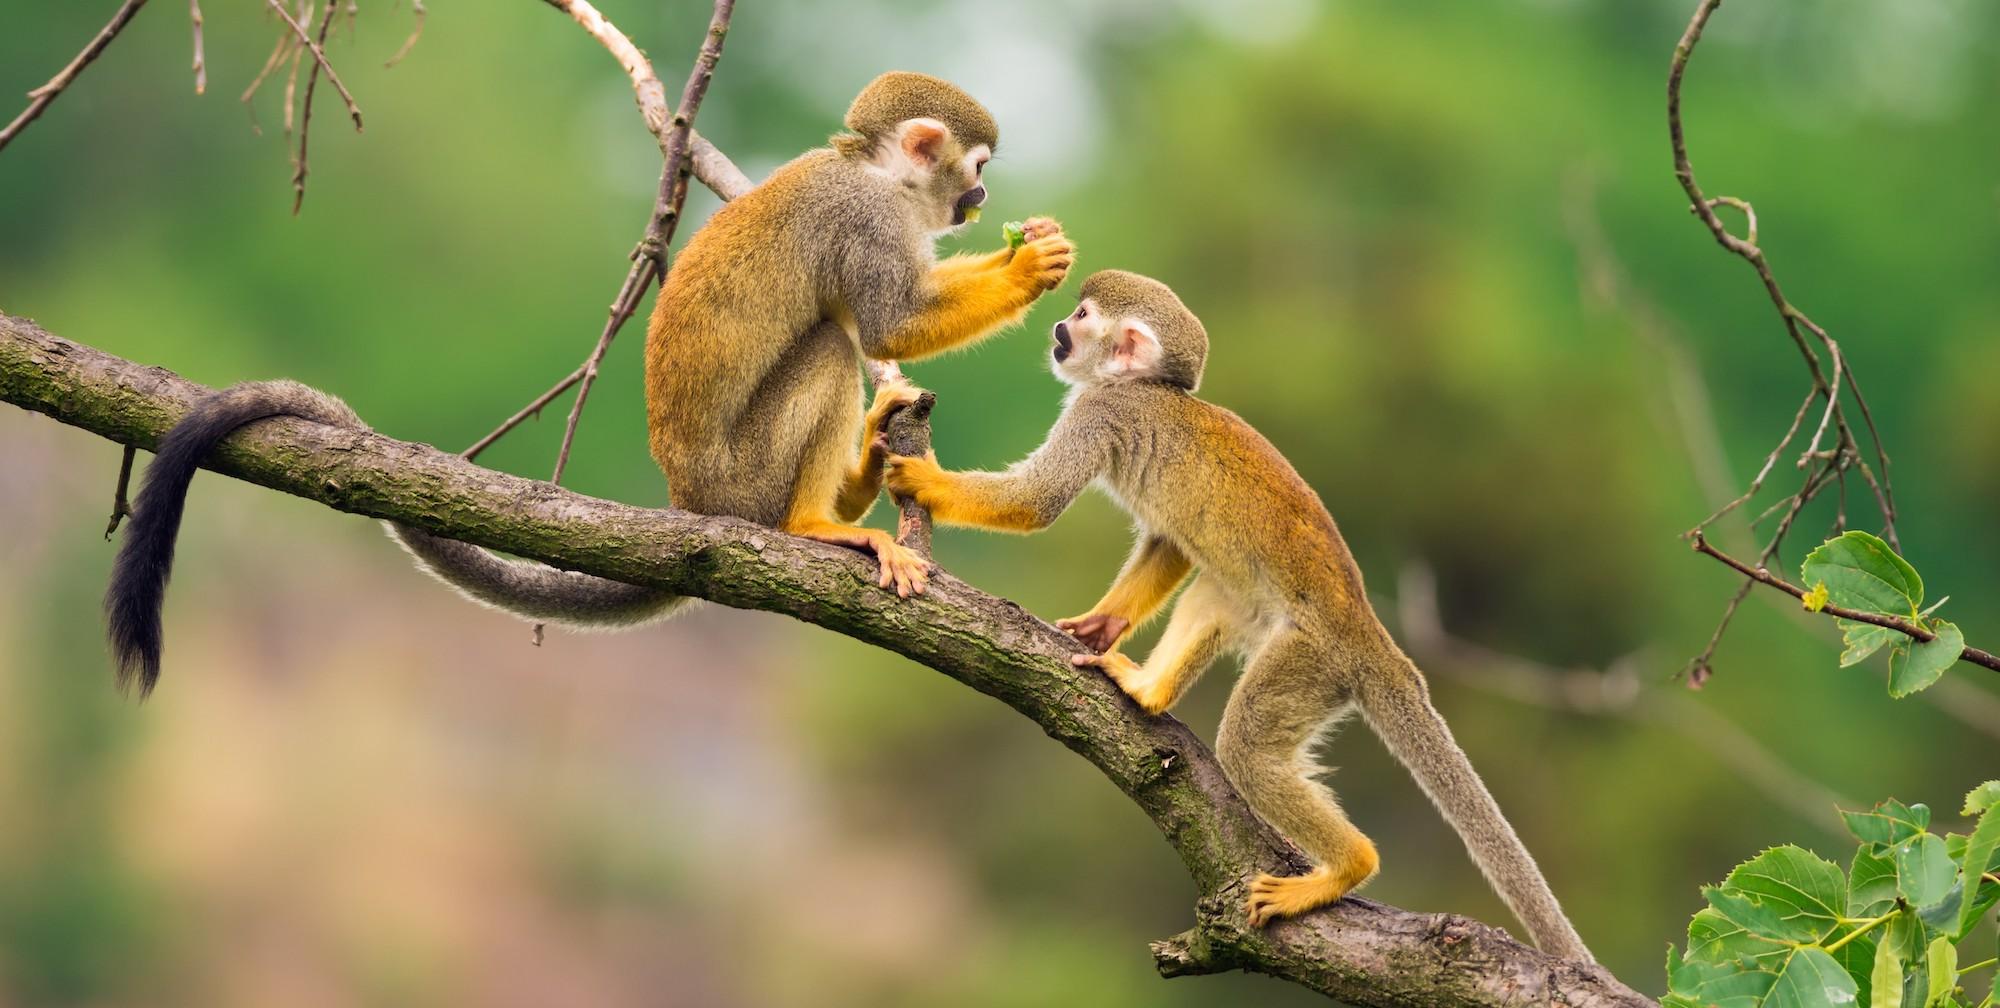 Peru travel guide: Amazon Jungle wildlife detail